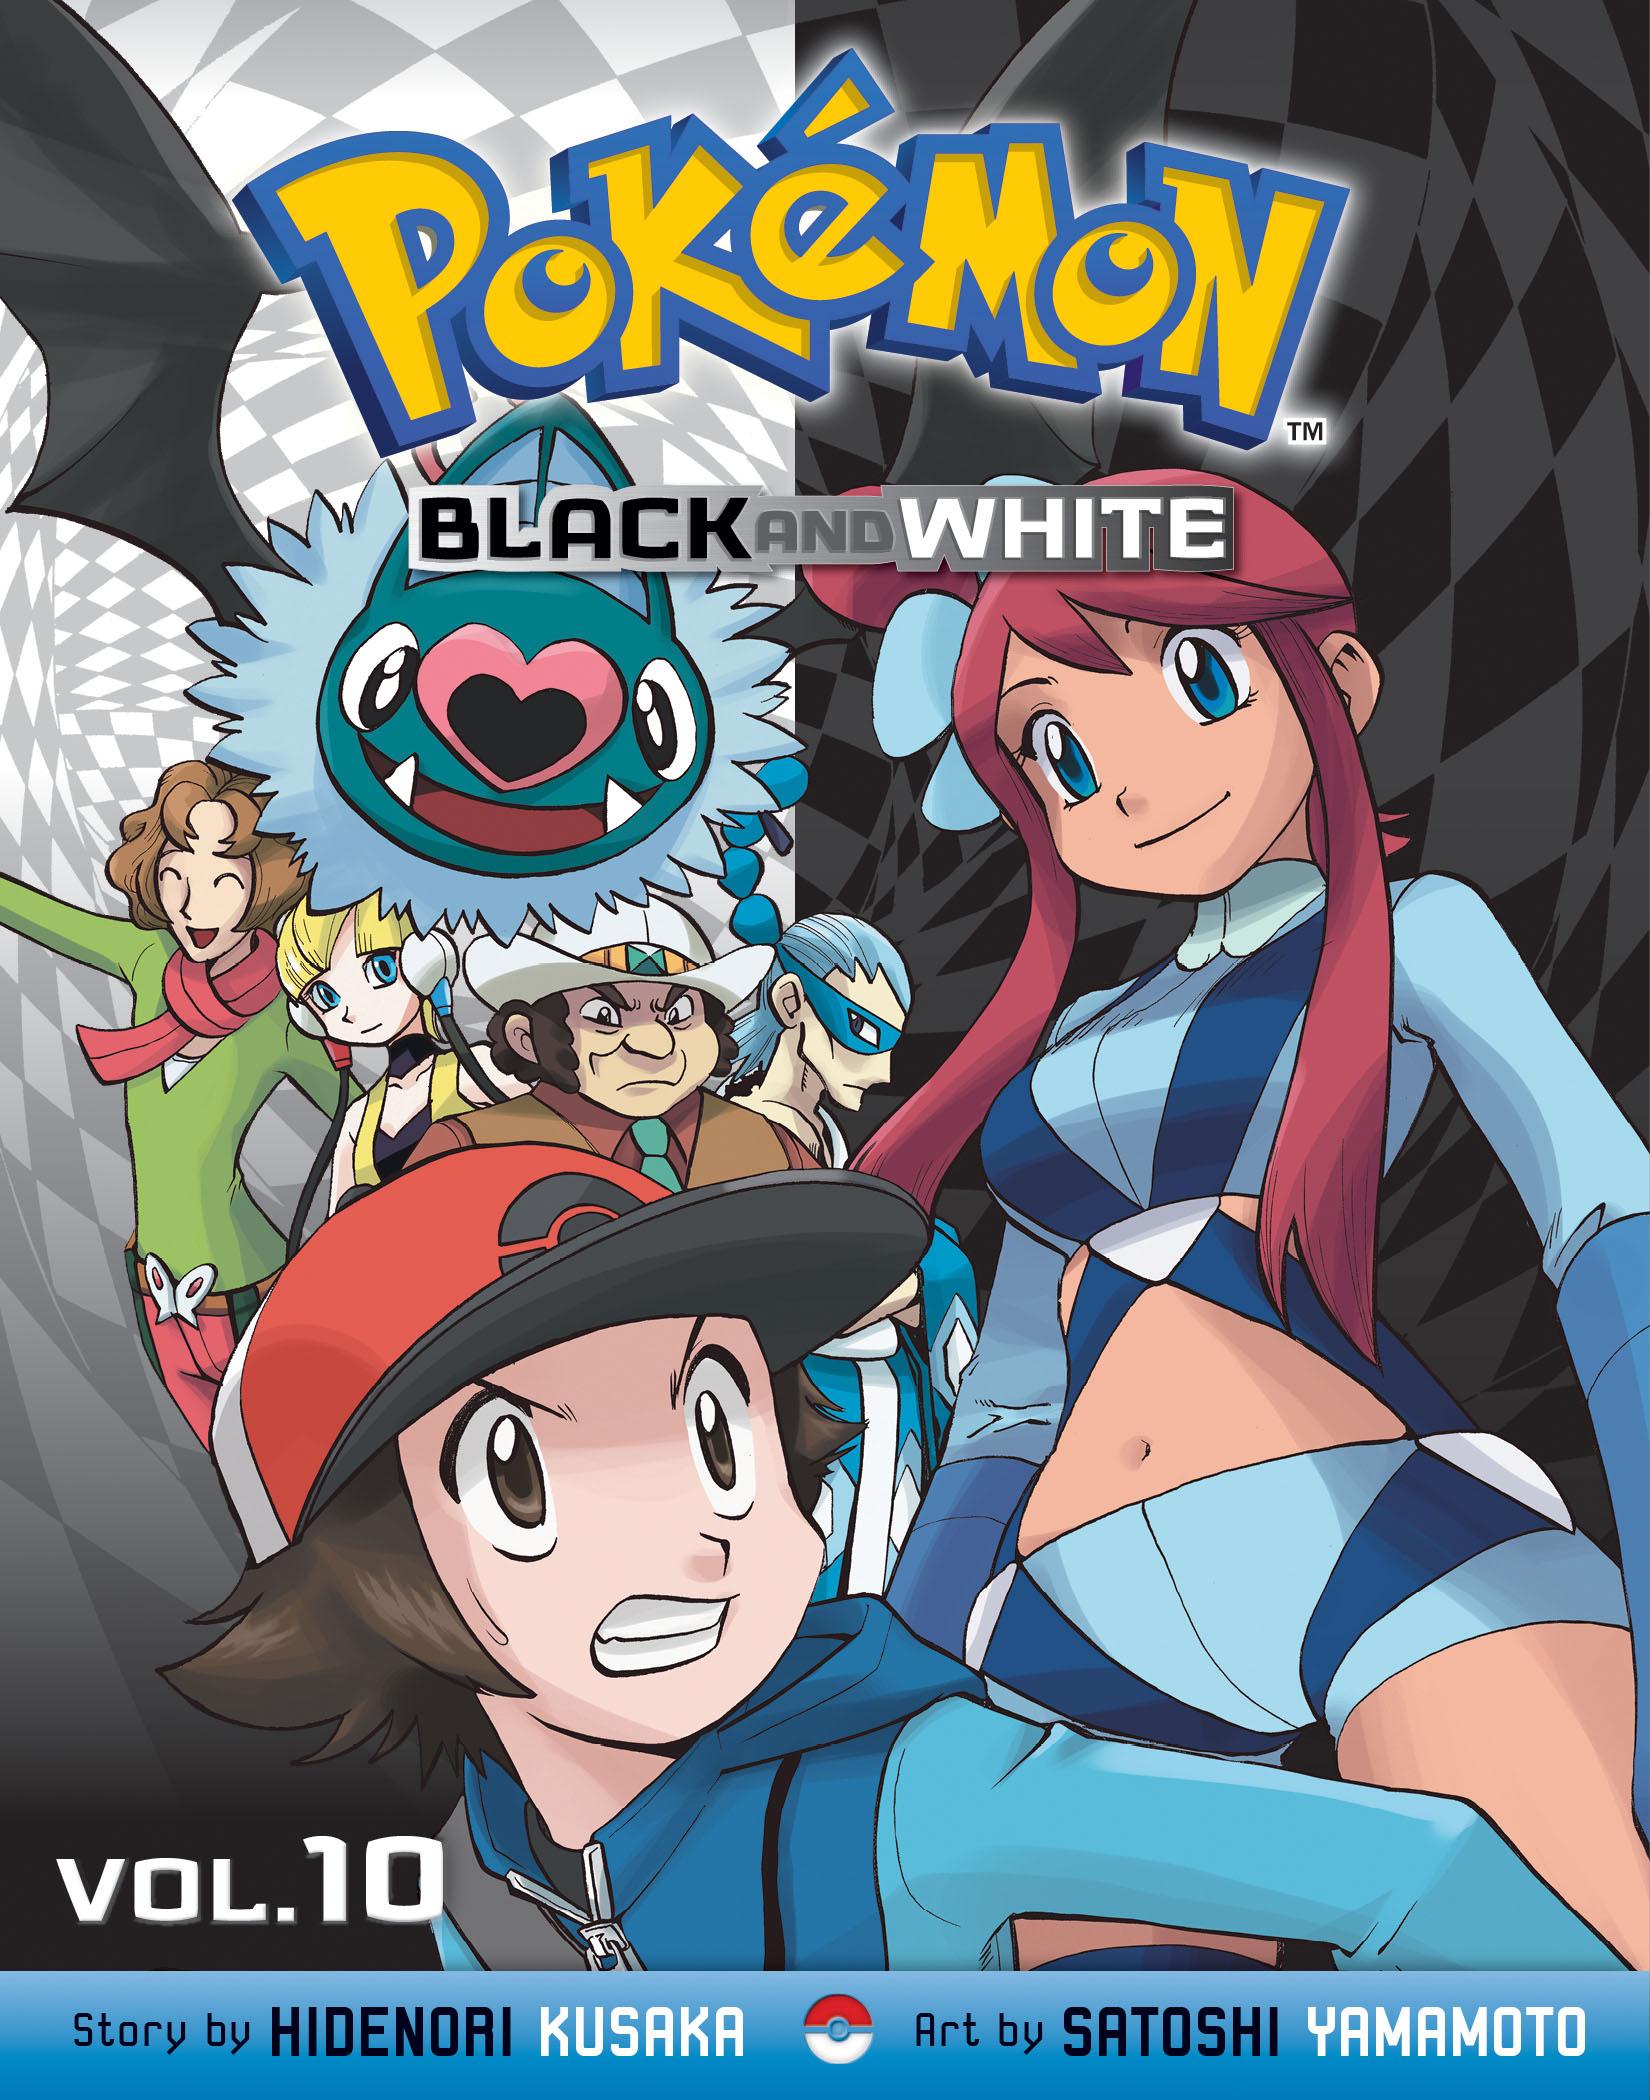 pokemon manga vol volume pokemon adventures books bw amazon viz paperback hidenori kusaka league satoshi states united pok pages author